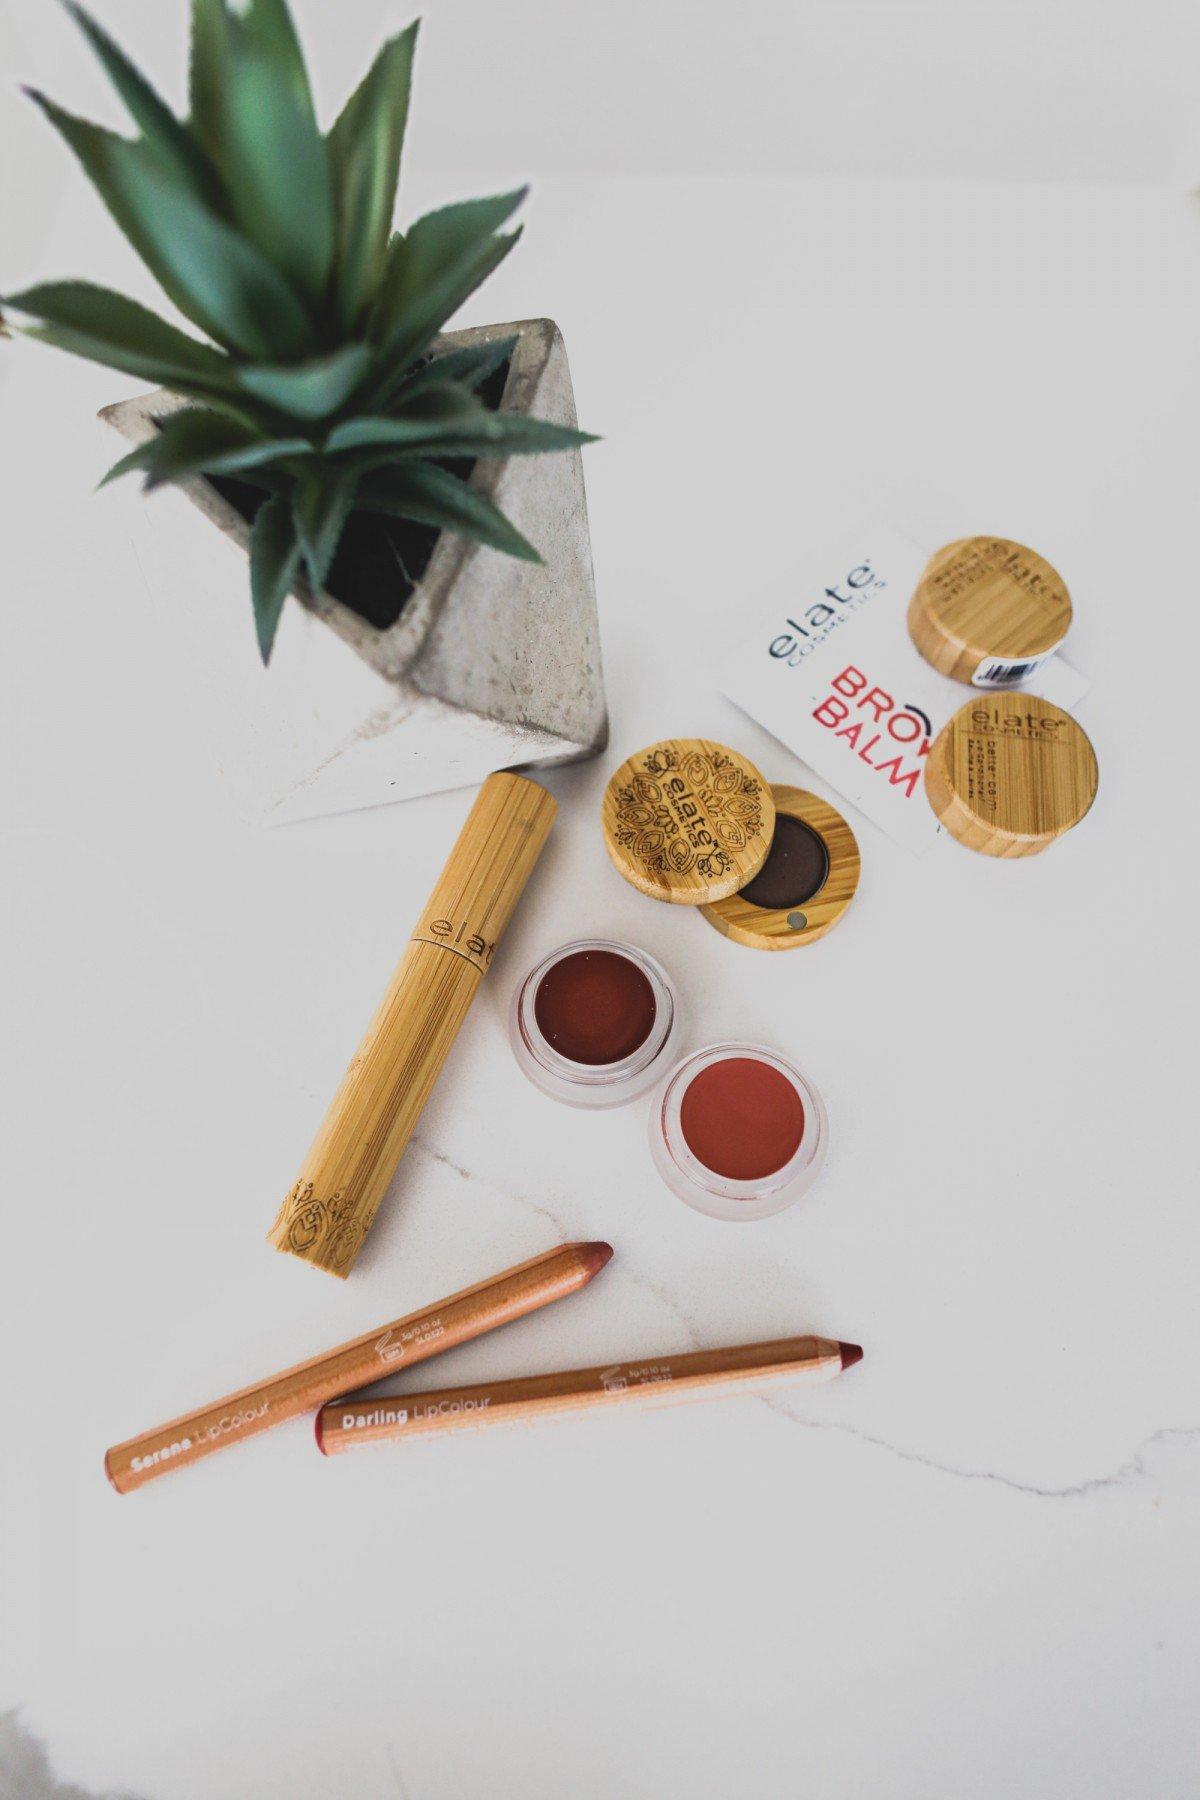 elate cosmetics sustainable makeup brand